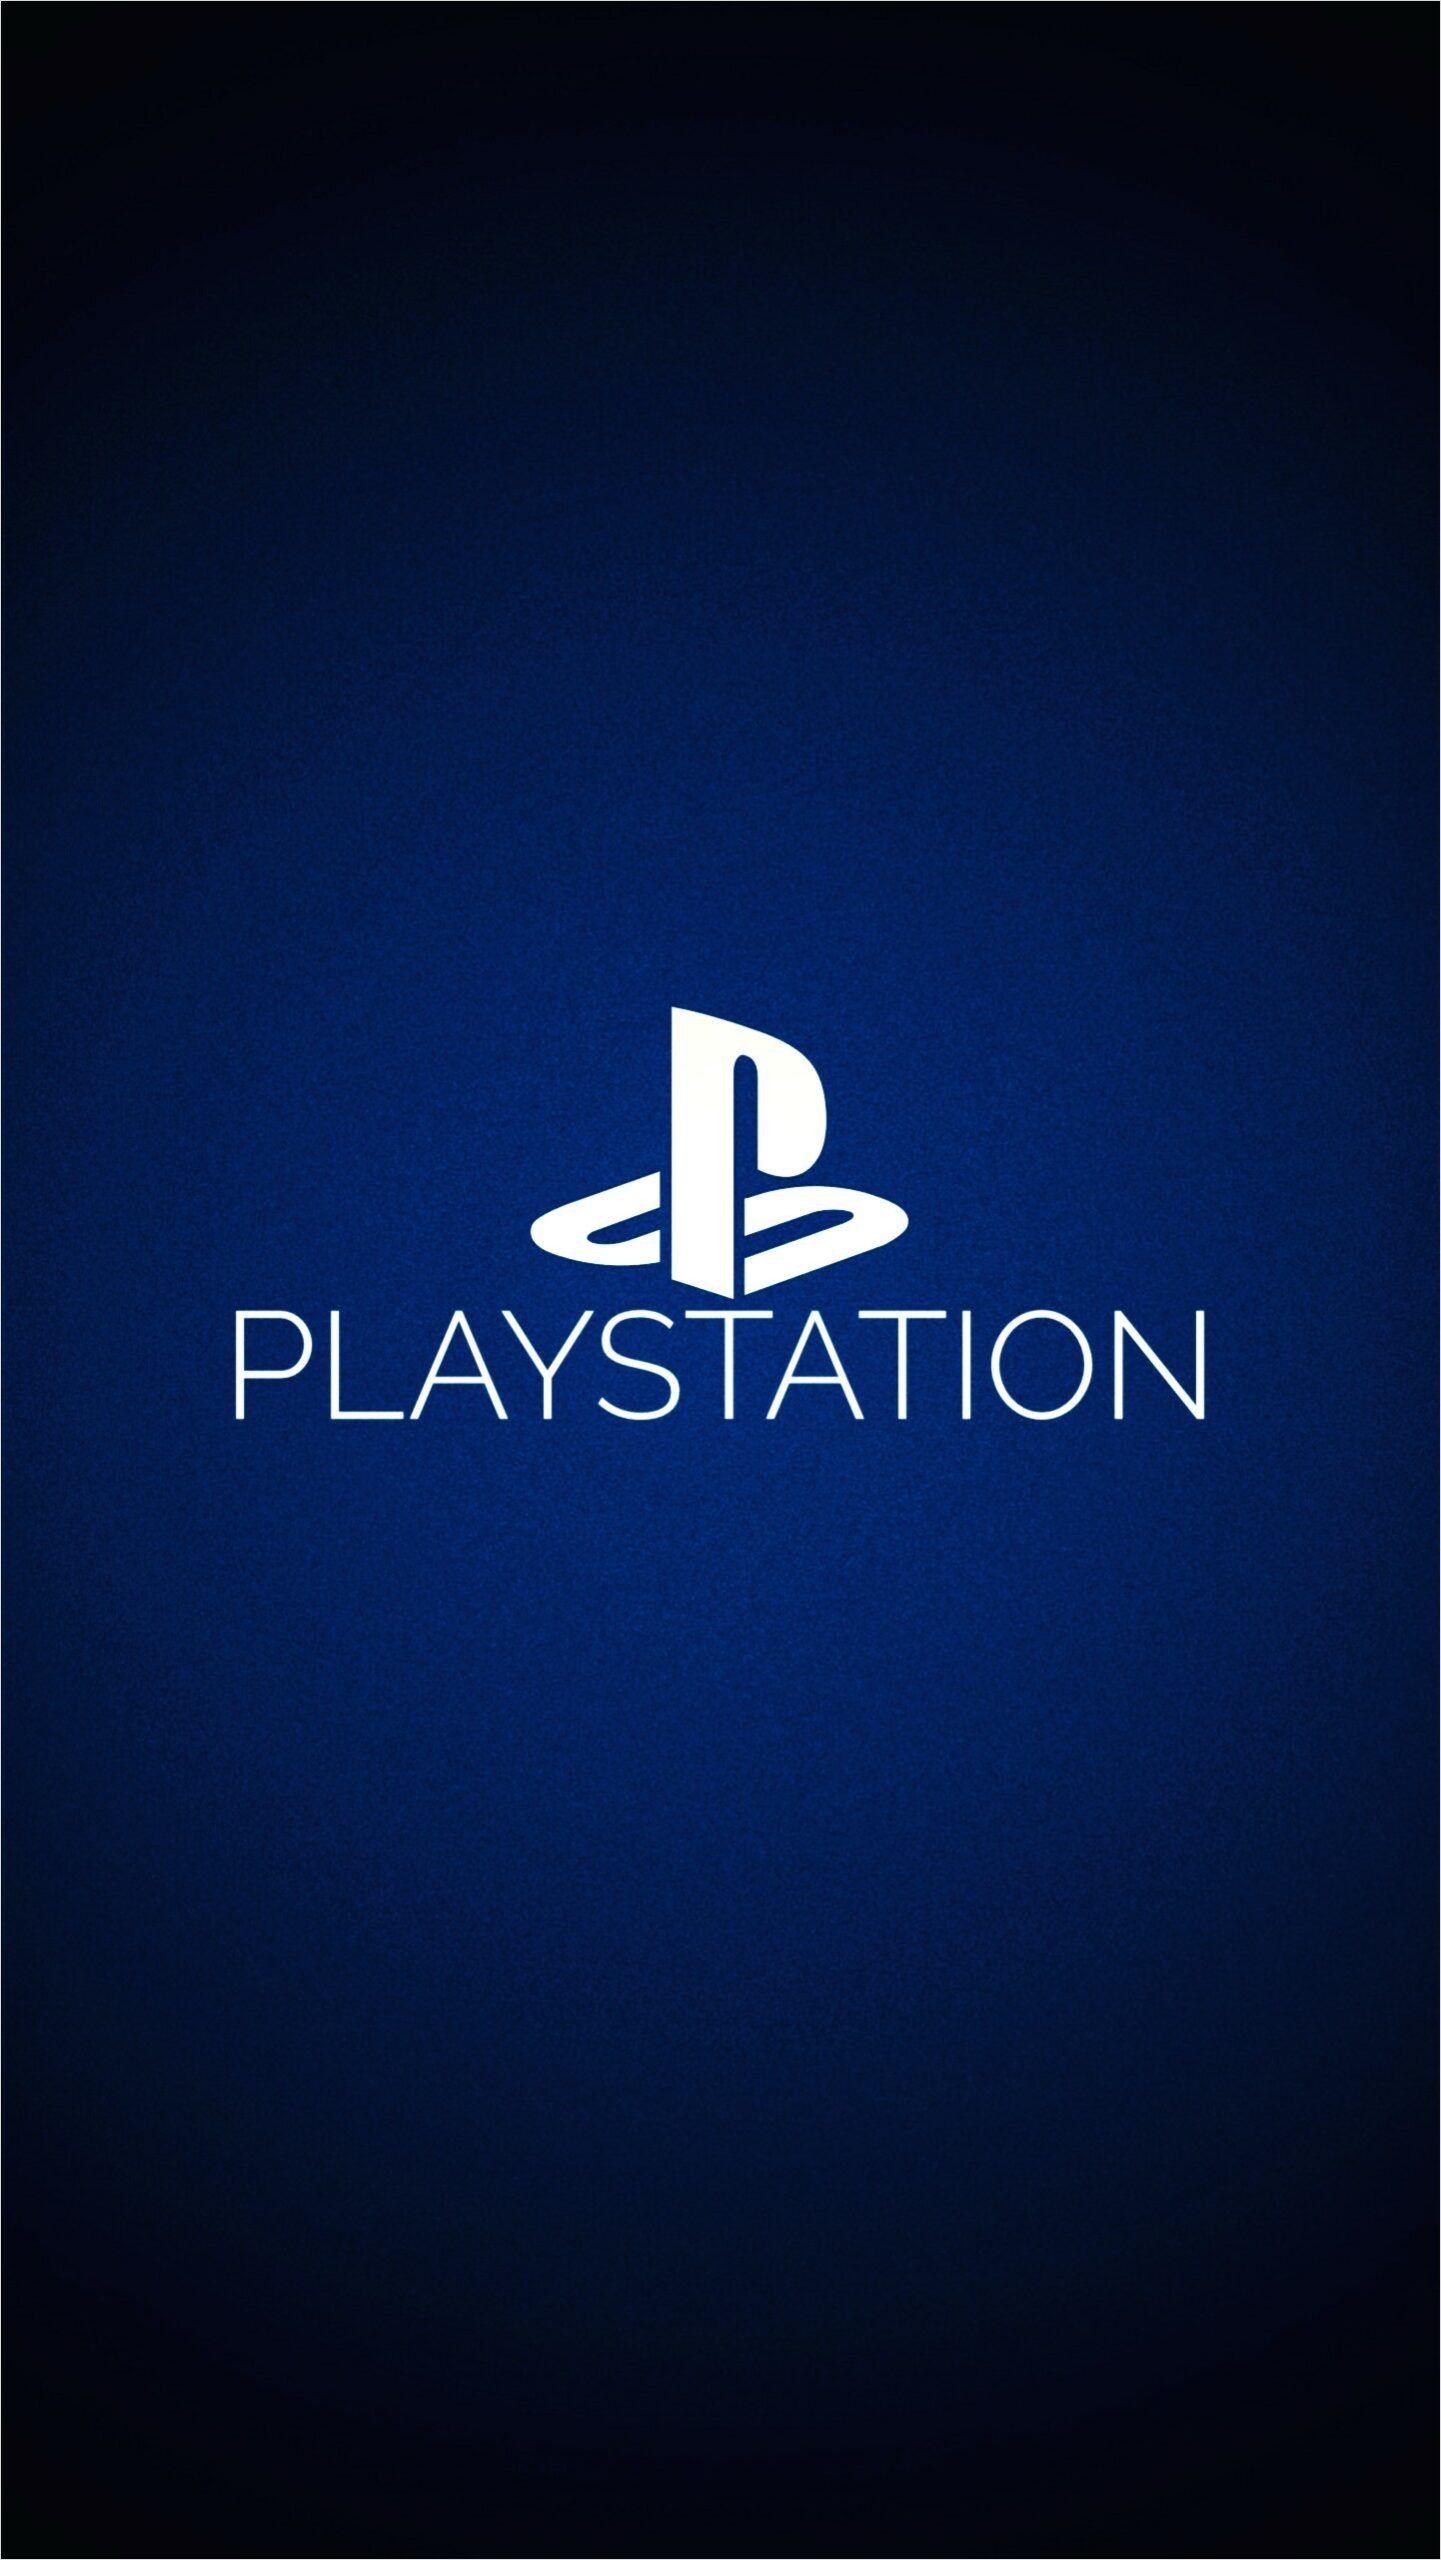 4k Amoled Playstation Mobile Wallpaper In 2020 Game Wallpaper Iphone Playstation Logo Playstation